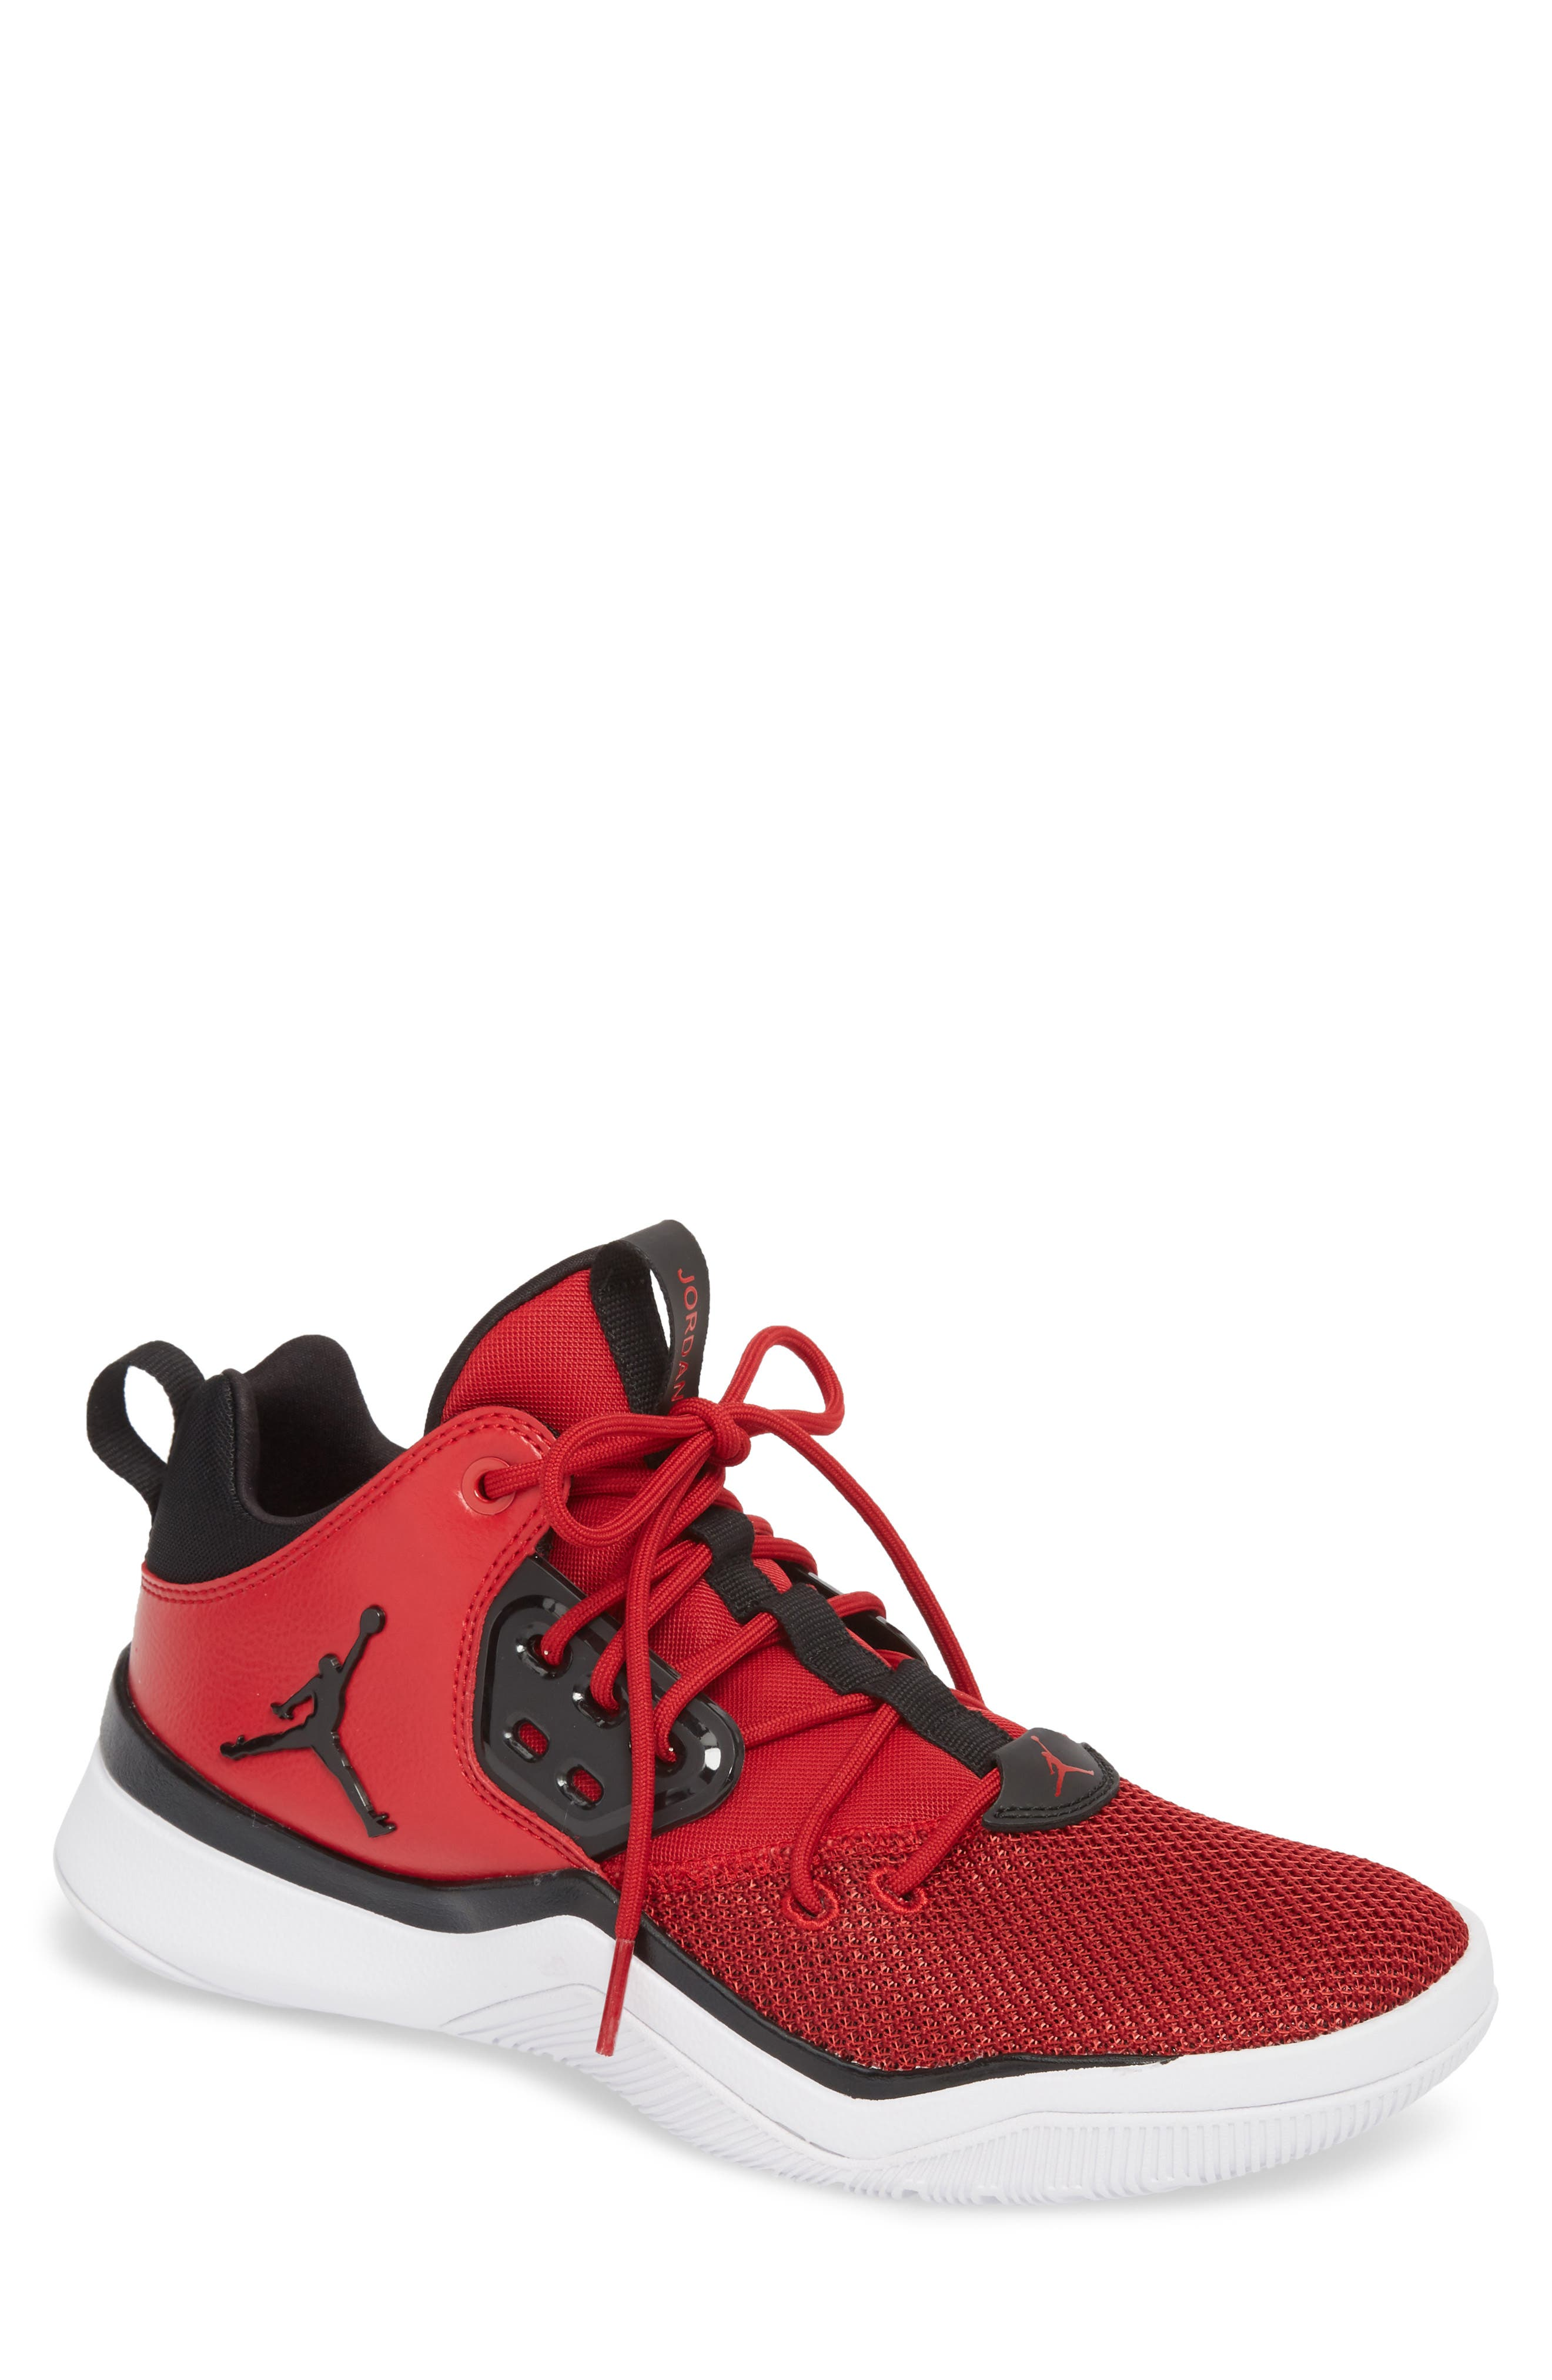 Jordan DNA Sneaker,                         Main,                         color, Gym Red/ Black/ White